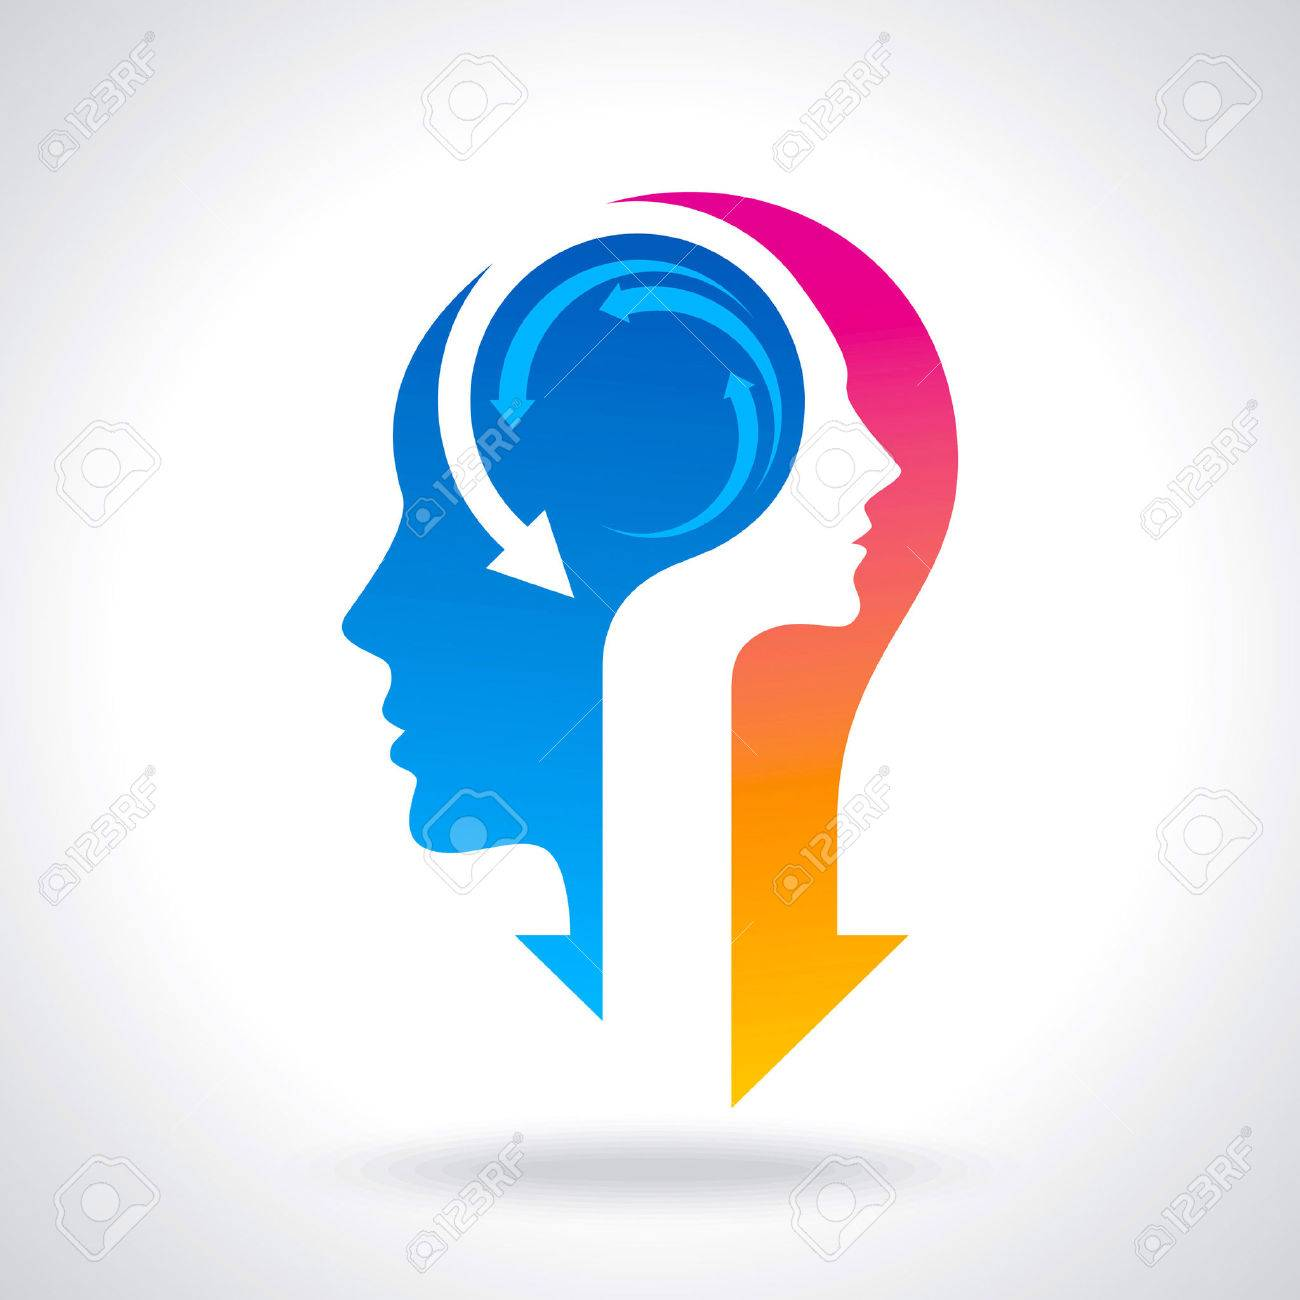 thinking business idea - 28374840